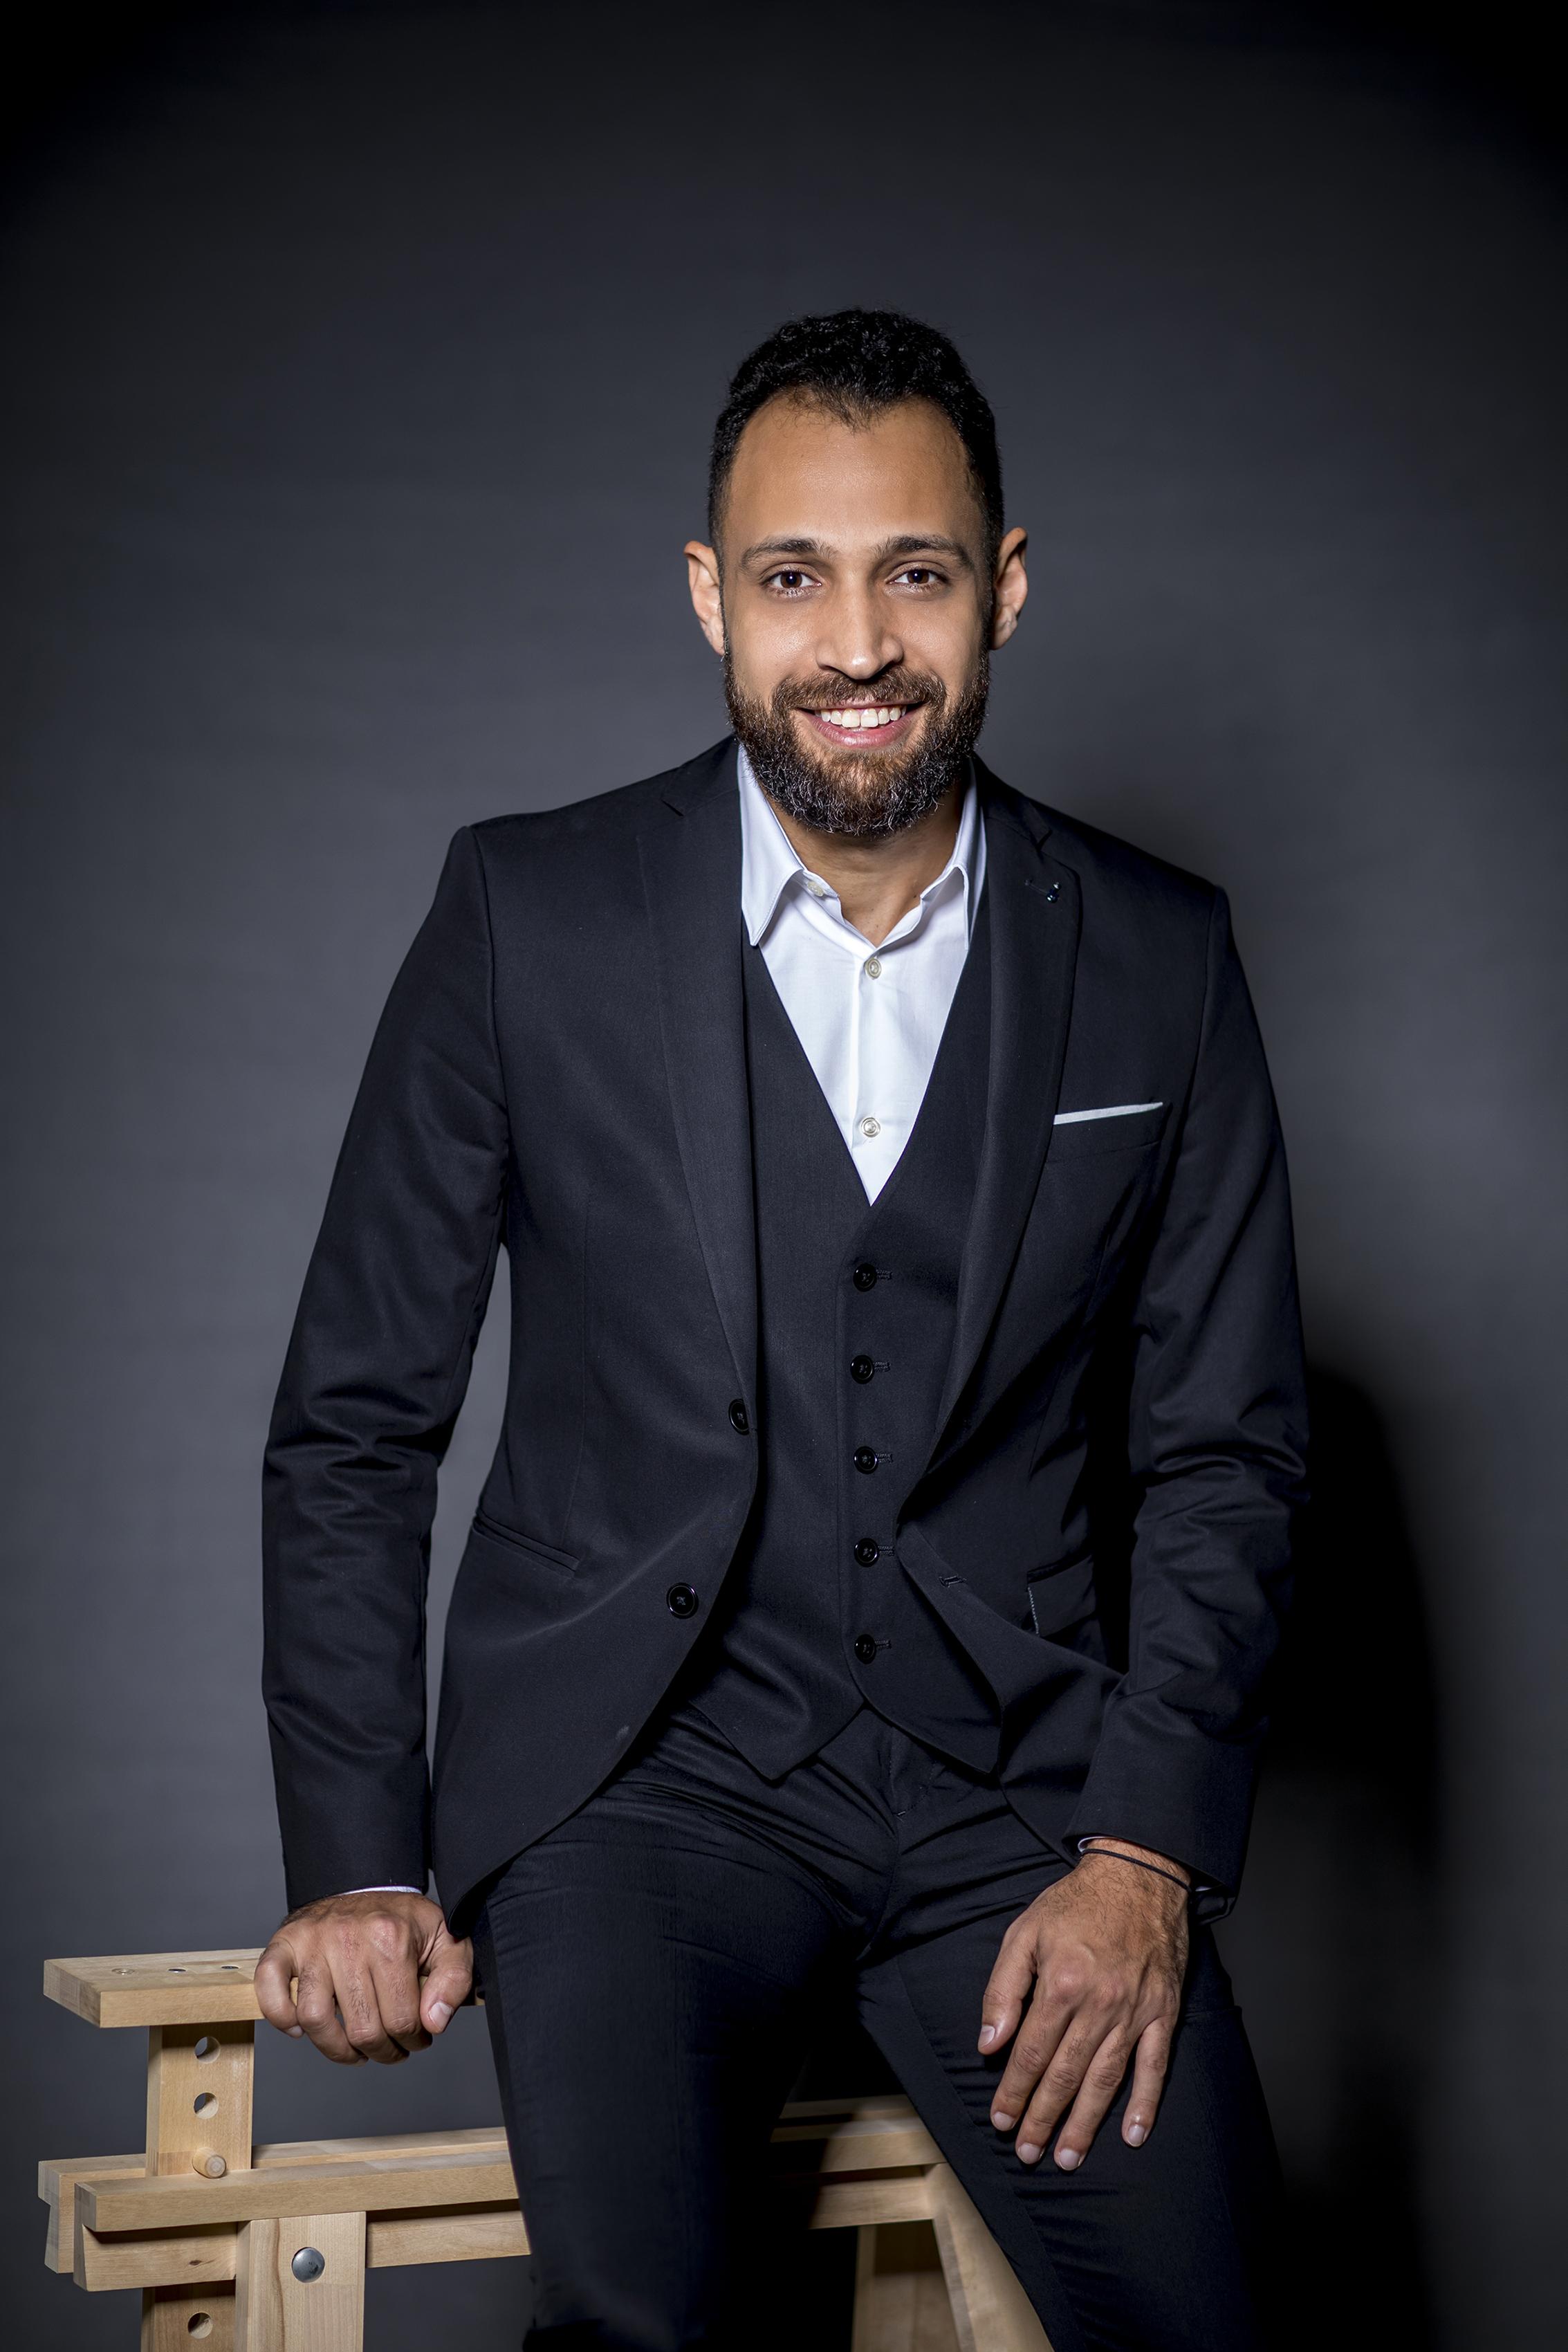 Five Minutes With Simon Naga Managing Director Of Al Futtaim Group